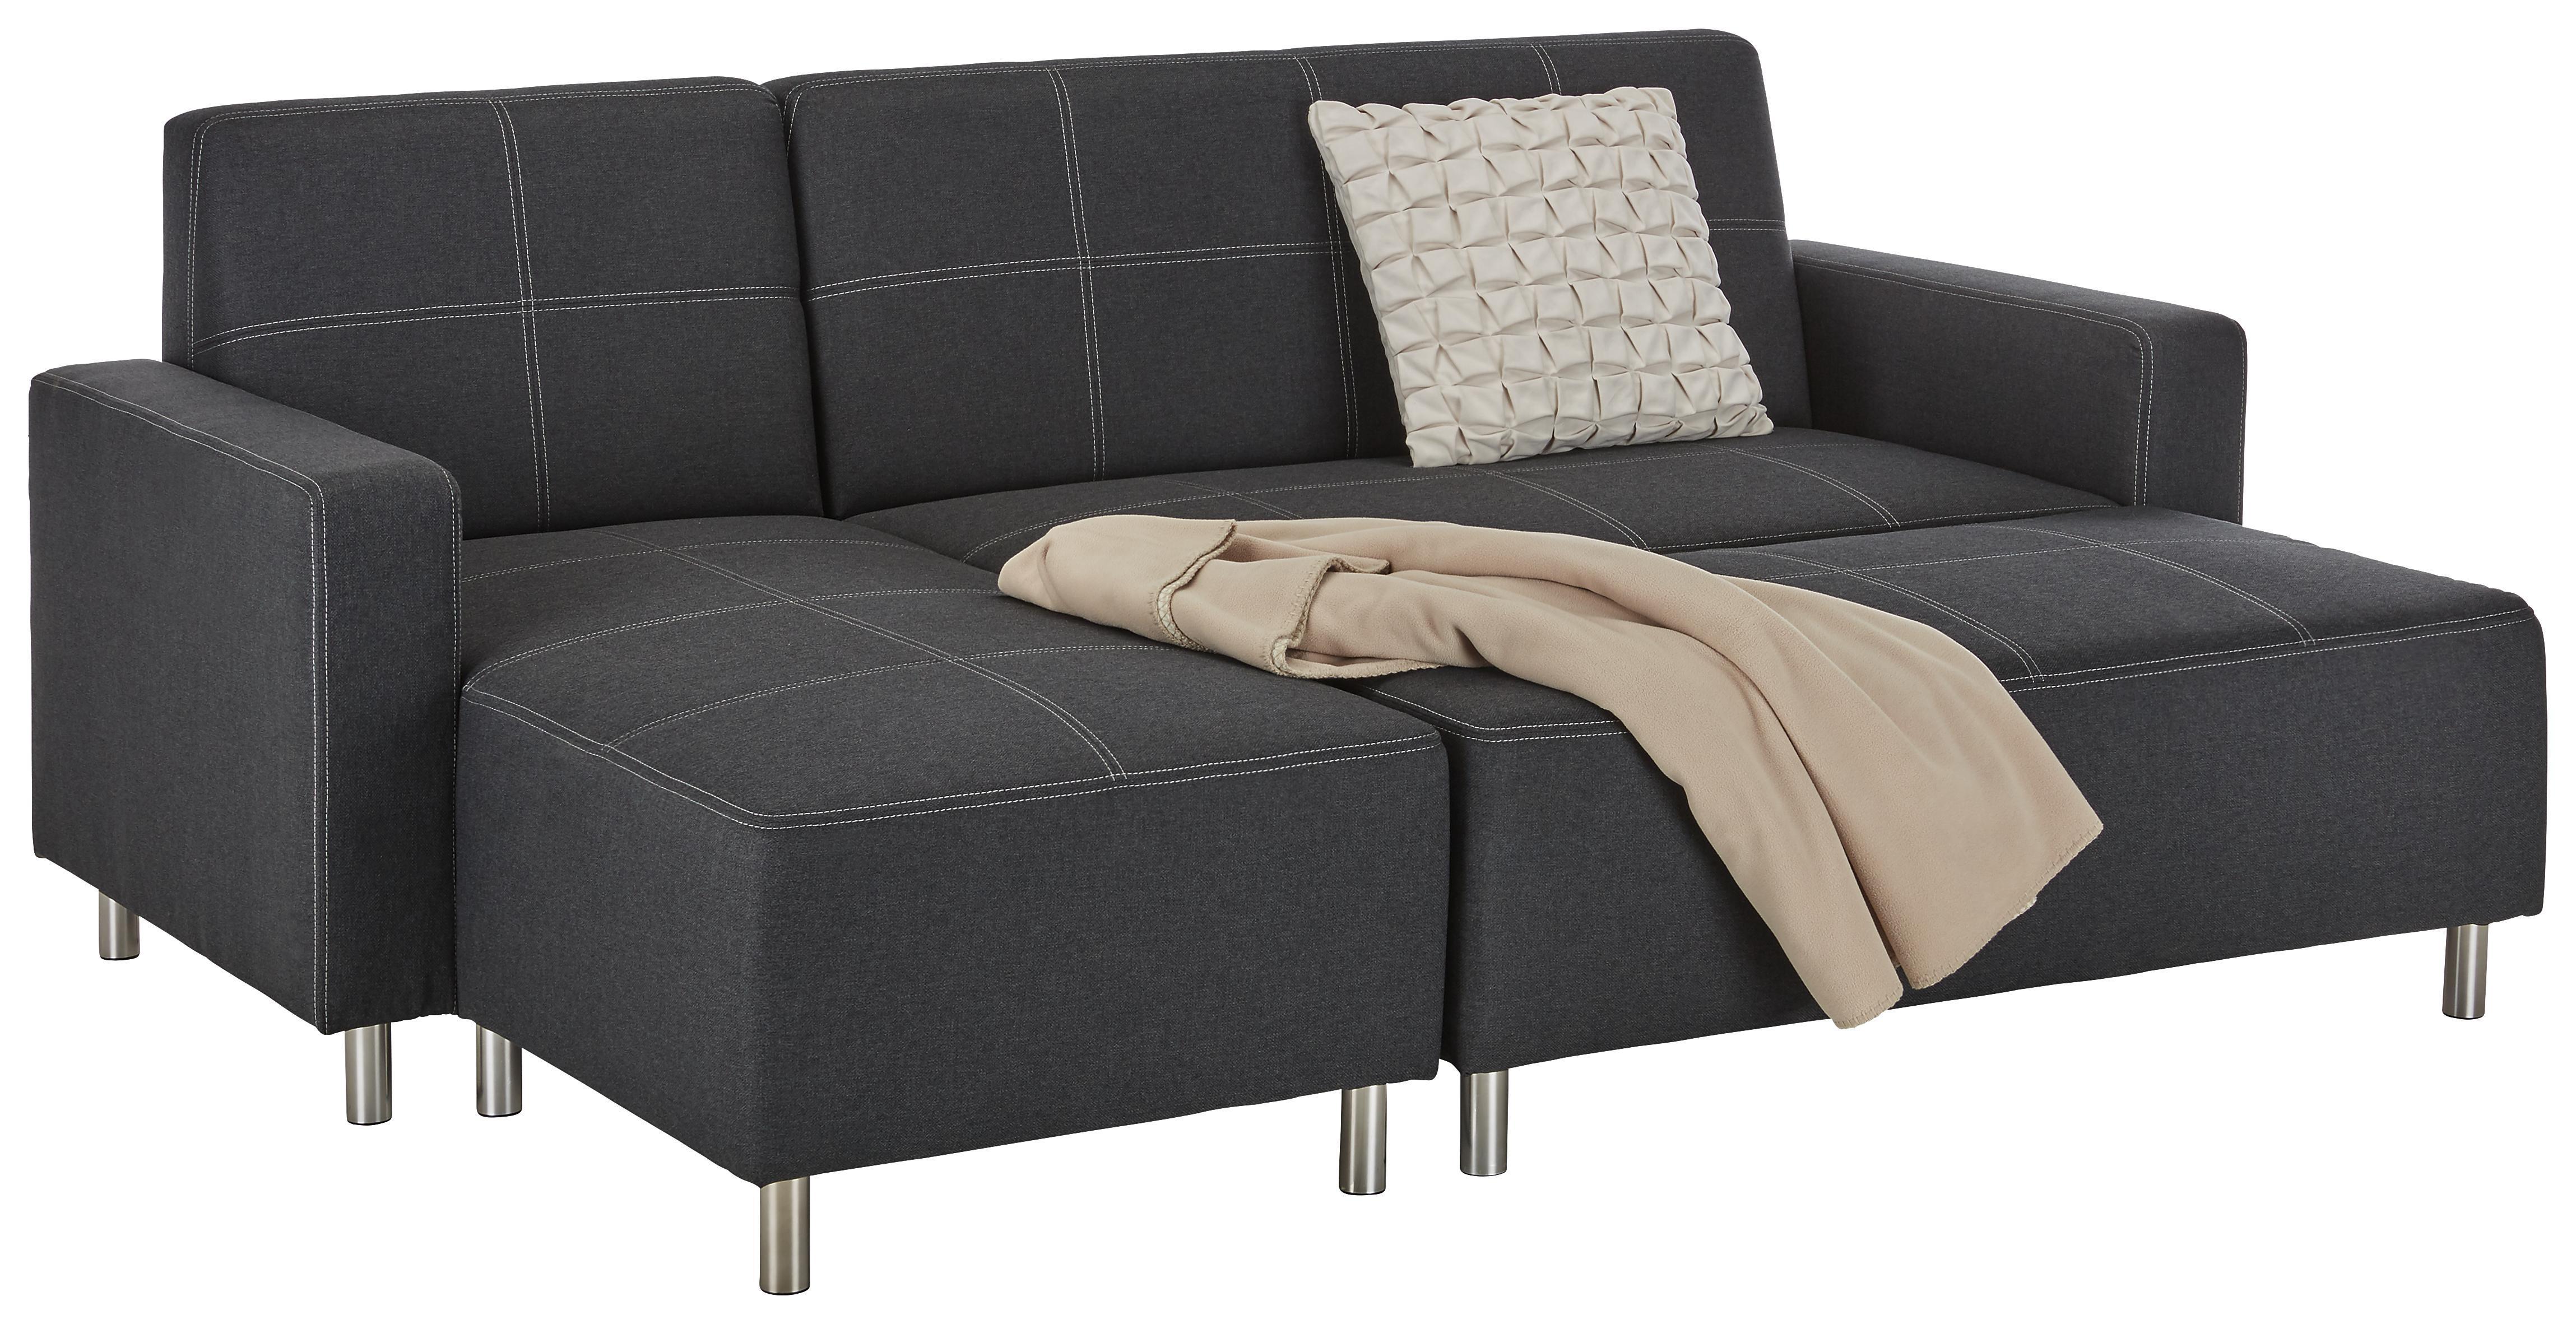 schlafsofa grn gnstig awesome askeby erbettsofa with schlafsofa grn gnstig amazing schlafsofa. Black Bedroom Furniture Sets. Home Design Ideas